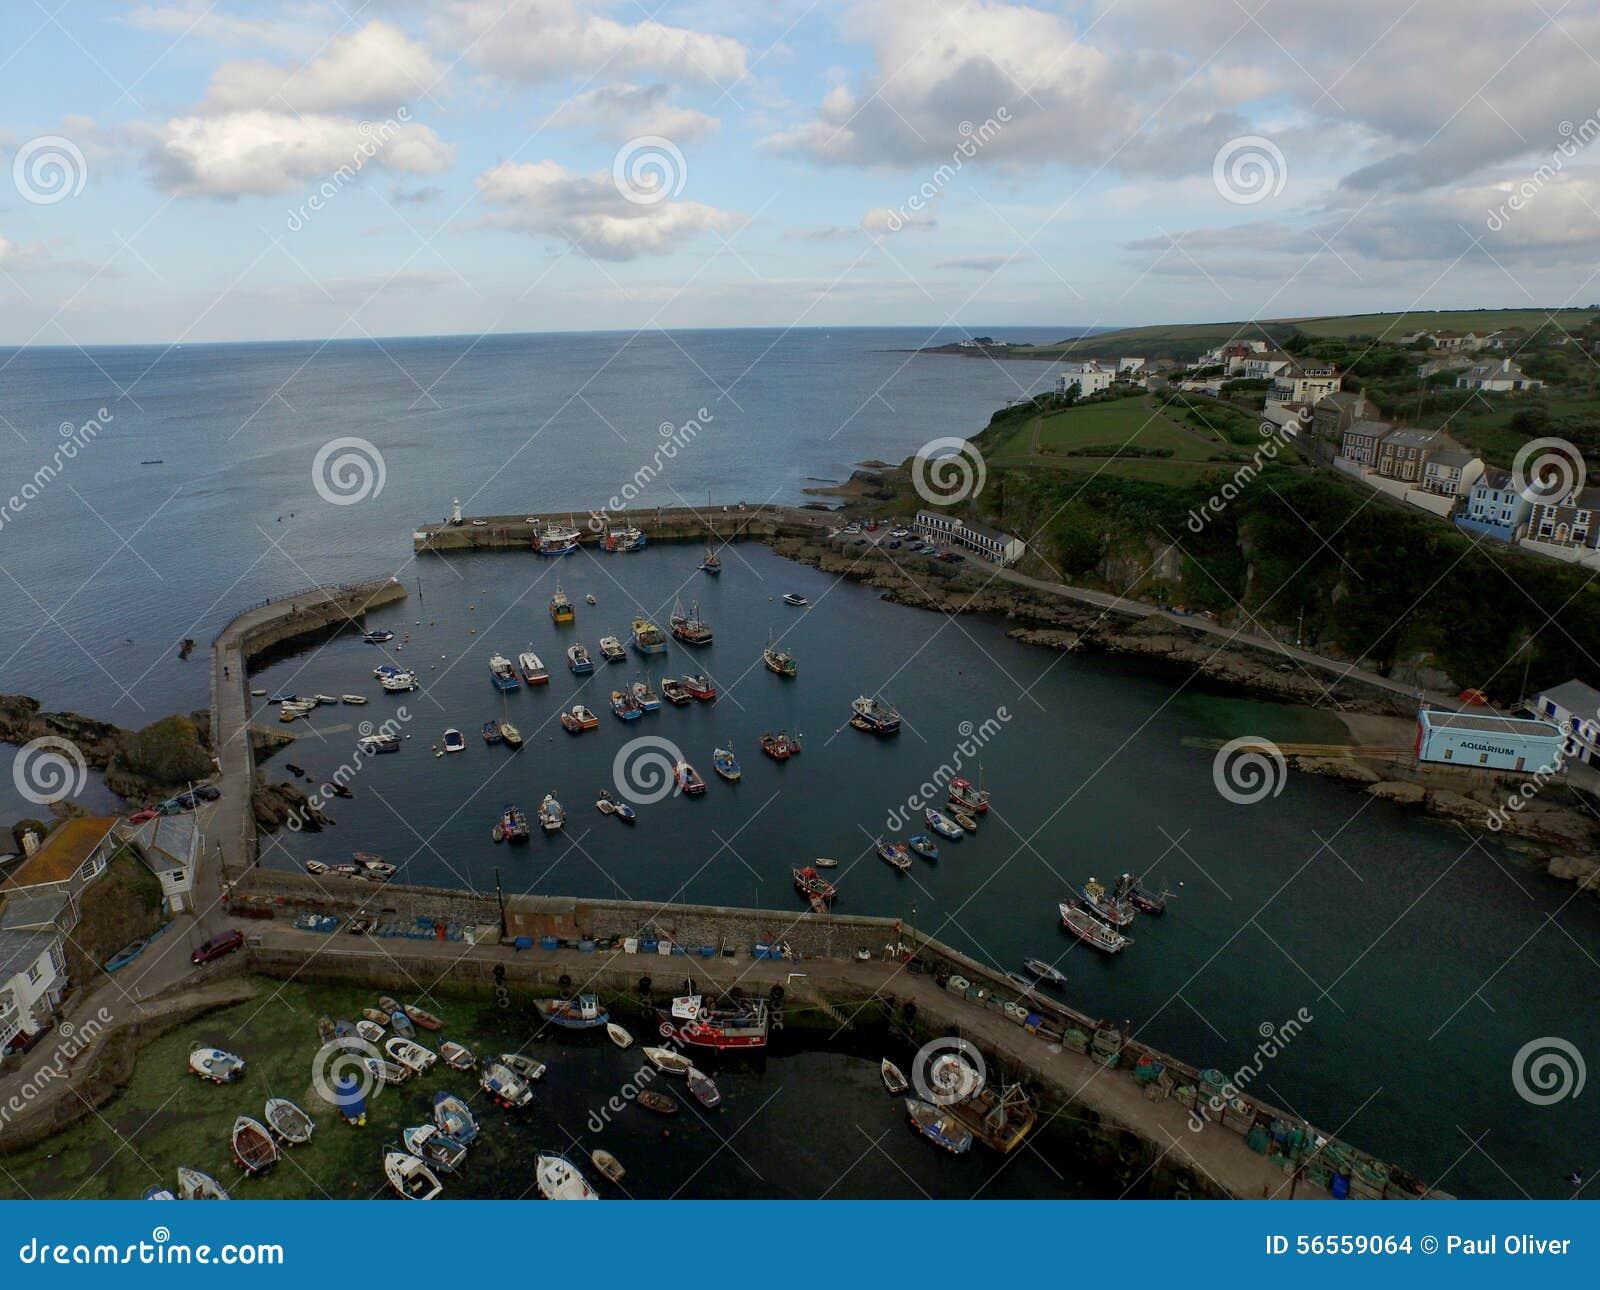 Download Κοίταγμα πέρα από το λιμάνι Mevergissey Στοκ Εικόνες - εικόνα από θάλασσα, πλάνο: 56559064